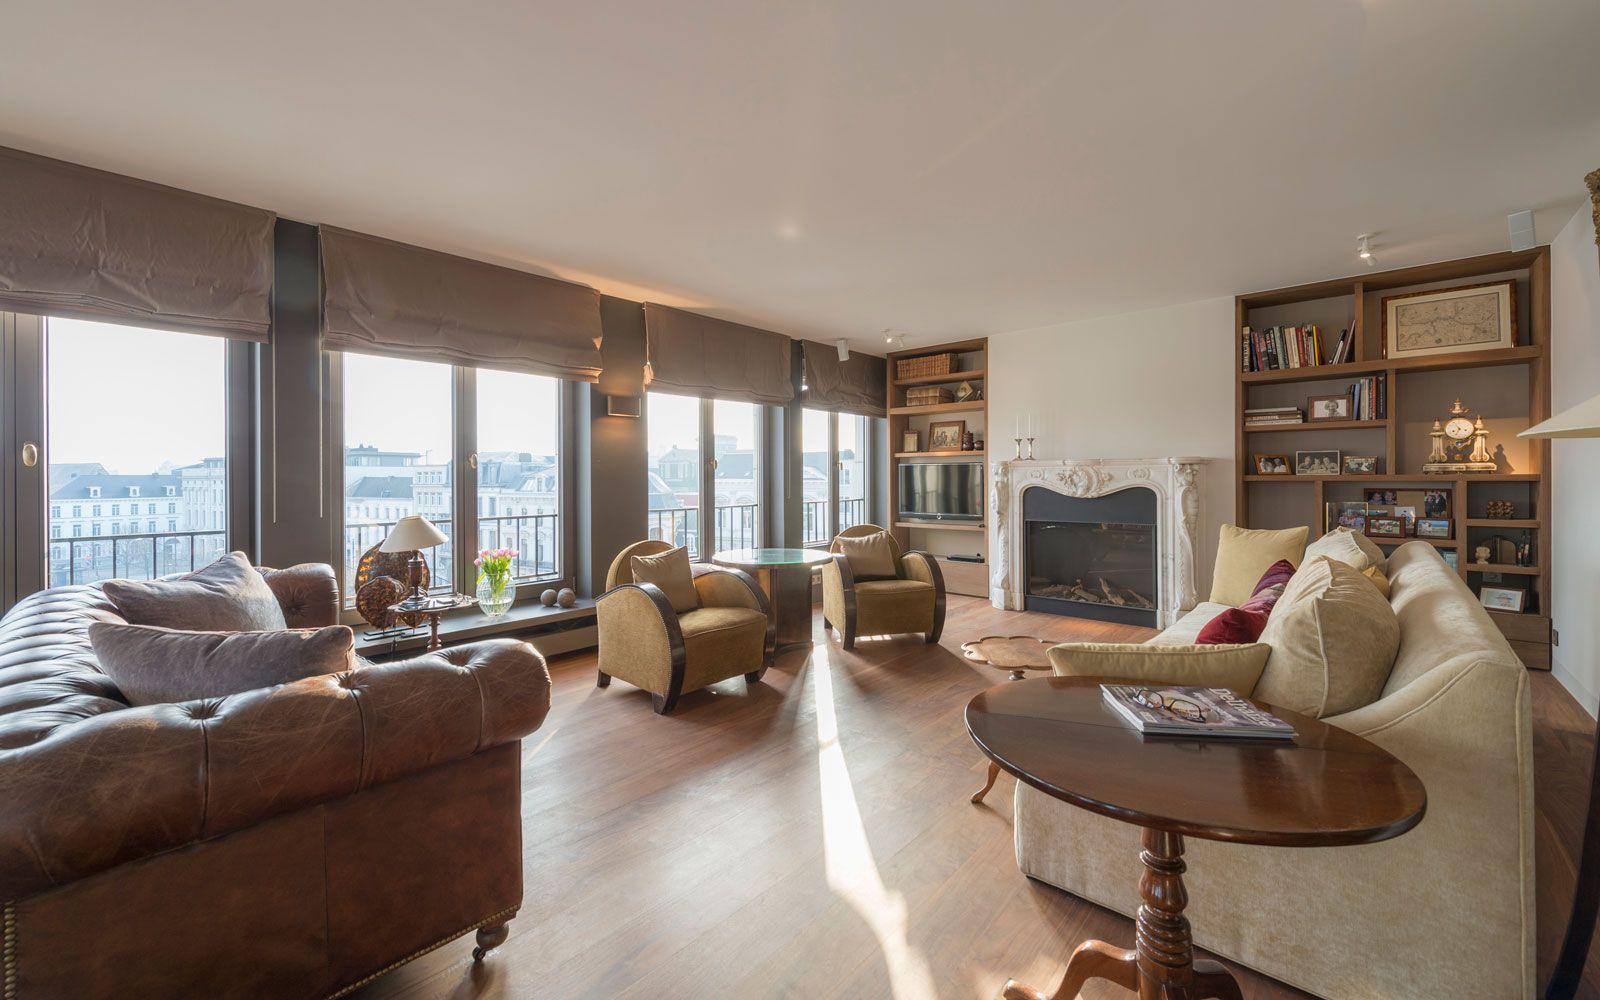 7x Klassiek Interieur : Klassiek interieur theartofliving eu luxury